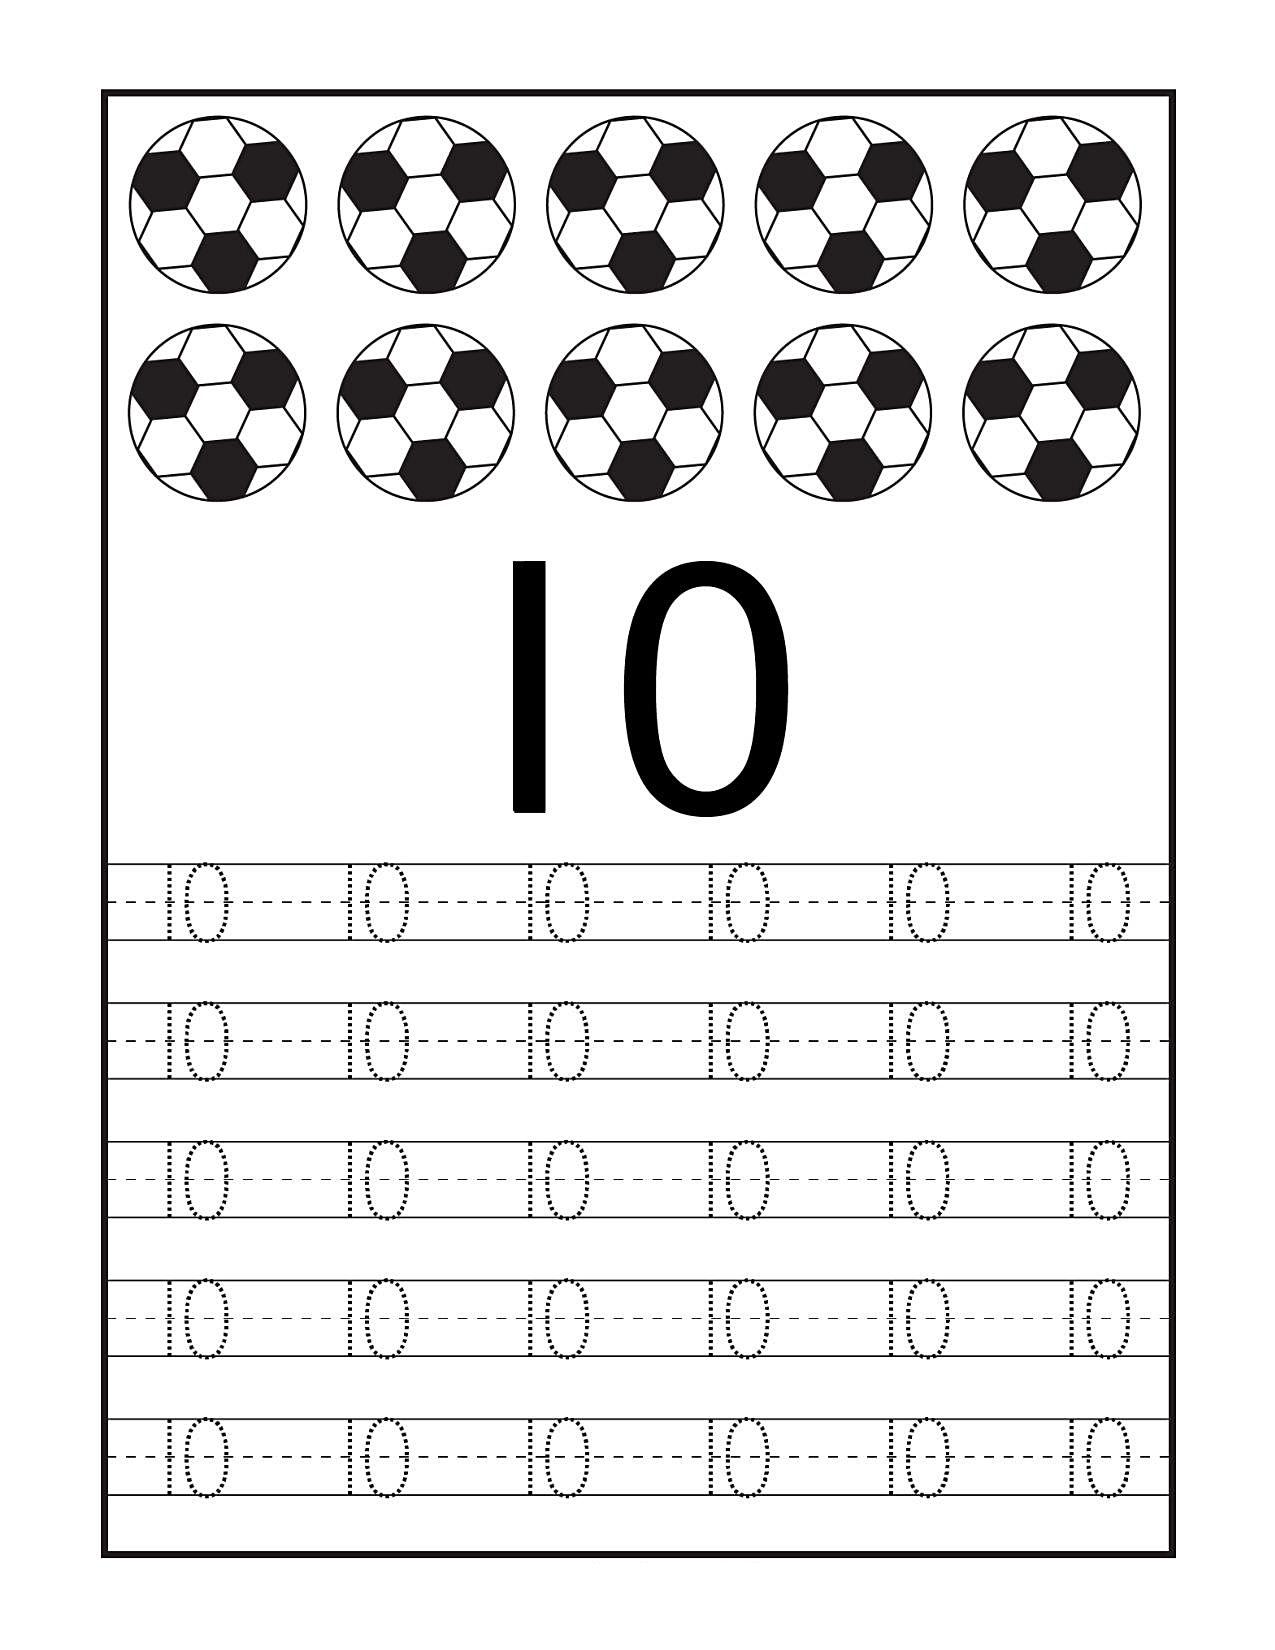 Pin By Liliya Mehaya On Number Worksheets Kindergarten Math Worksheets Free Alphabet Worksheets Preschool Fun Worksheets For Kids [ 1650 x 1275 Pixel ]